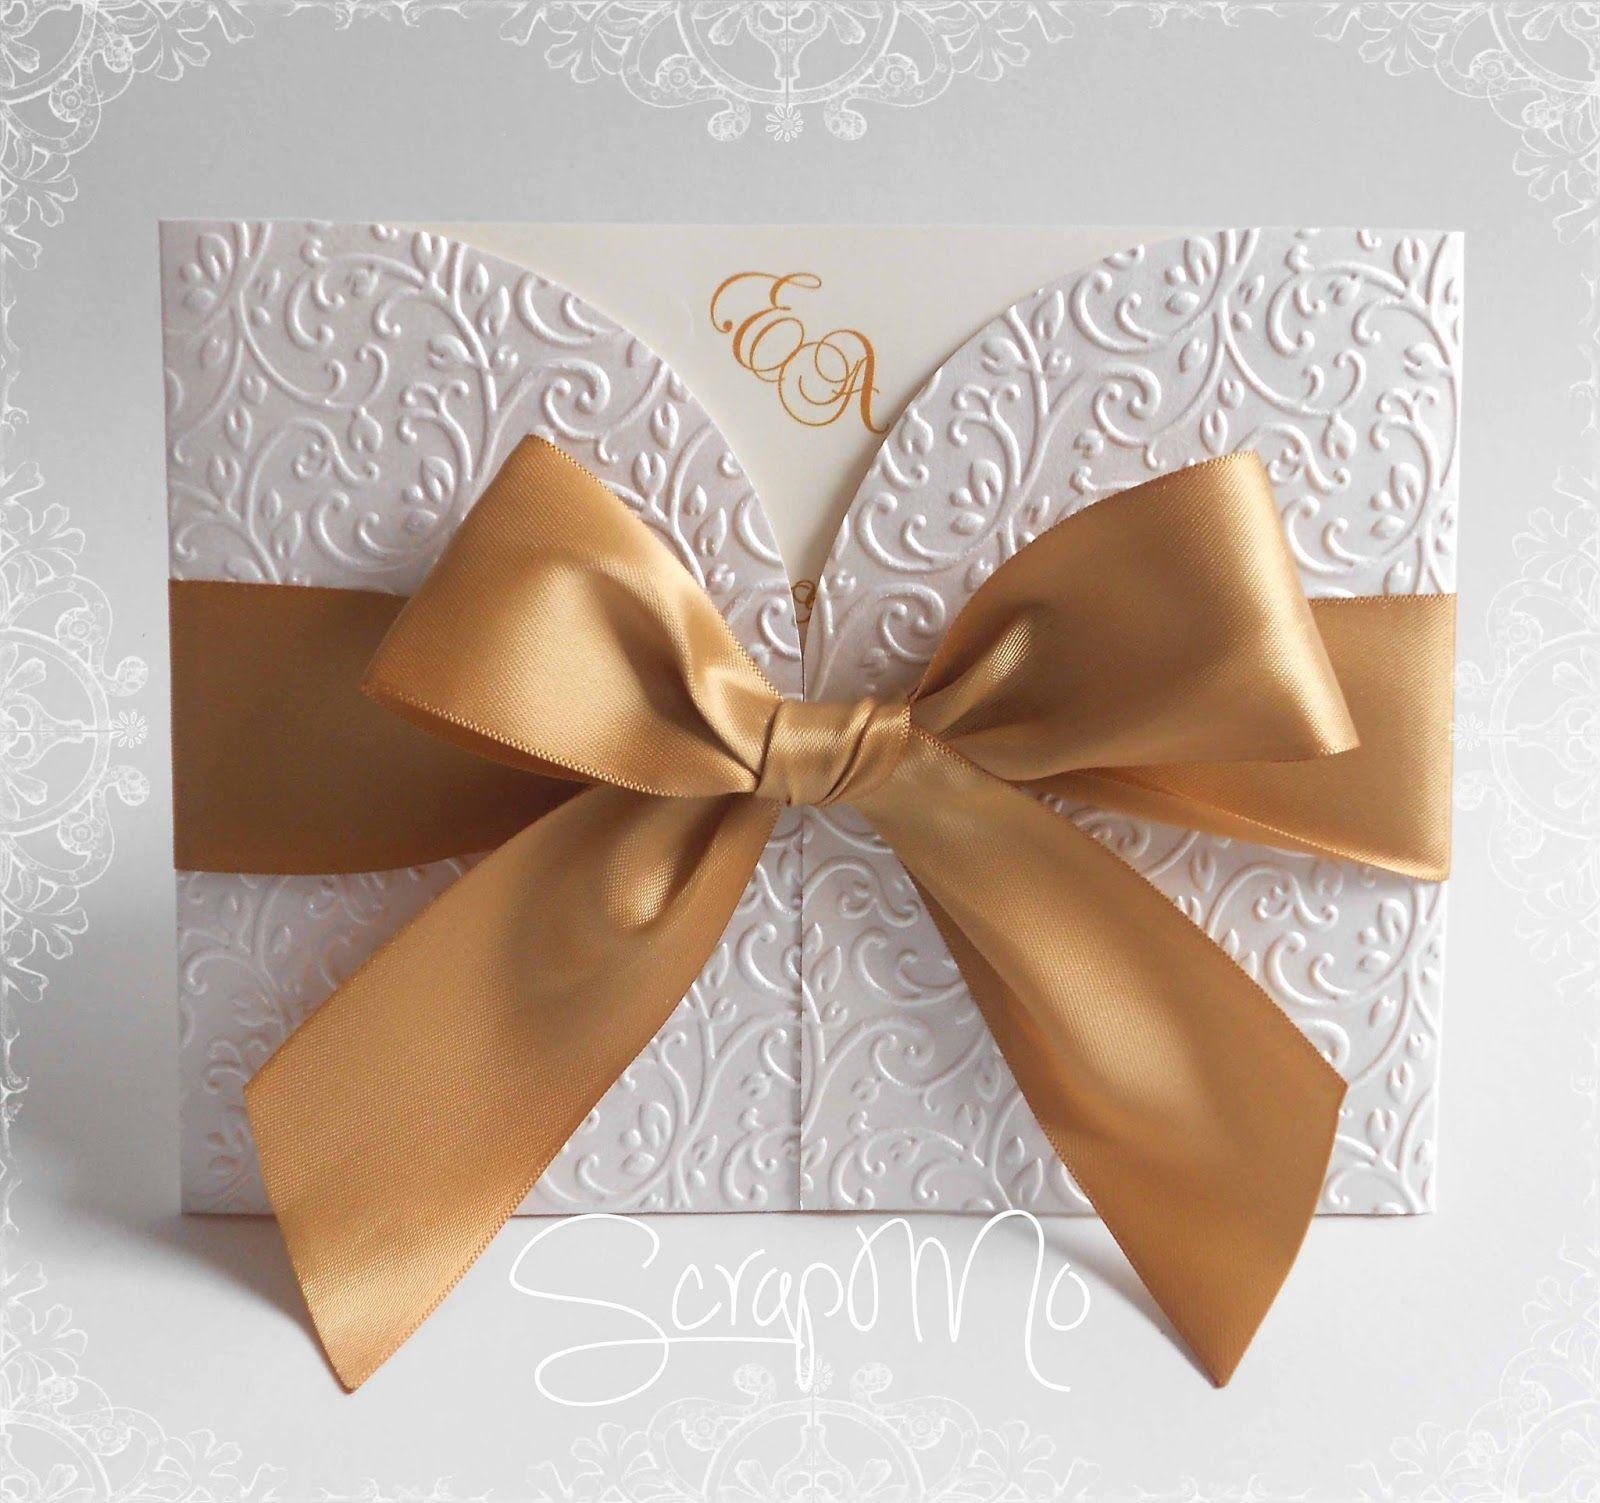 Pin De Kritty En Wedding Cards Invitaciones De Boda Bodas